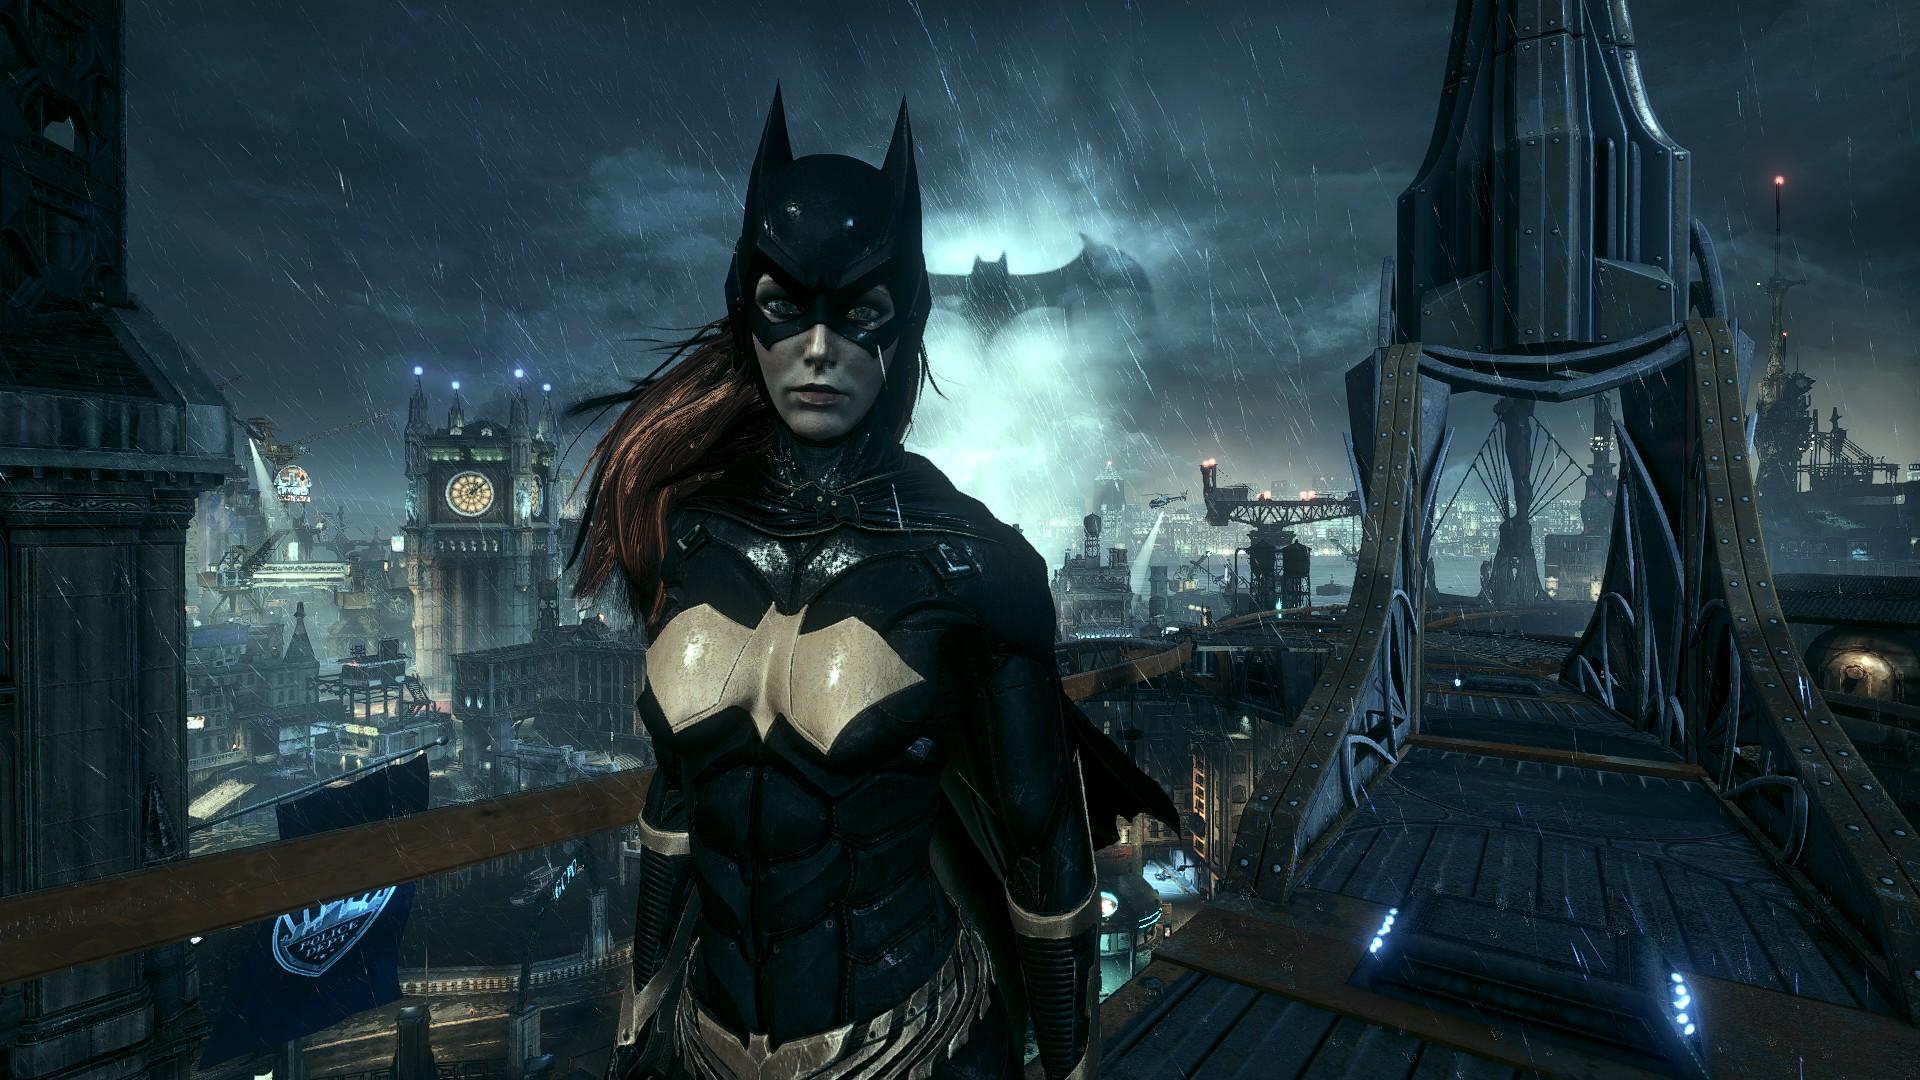 20191012150701_2.jpg - Batman: Arkham Knight